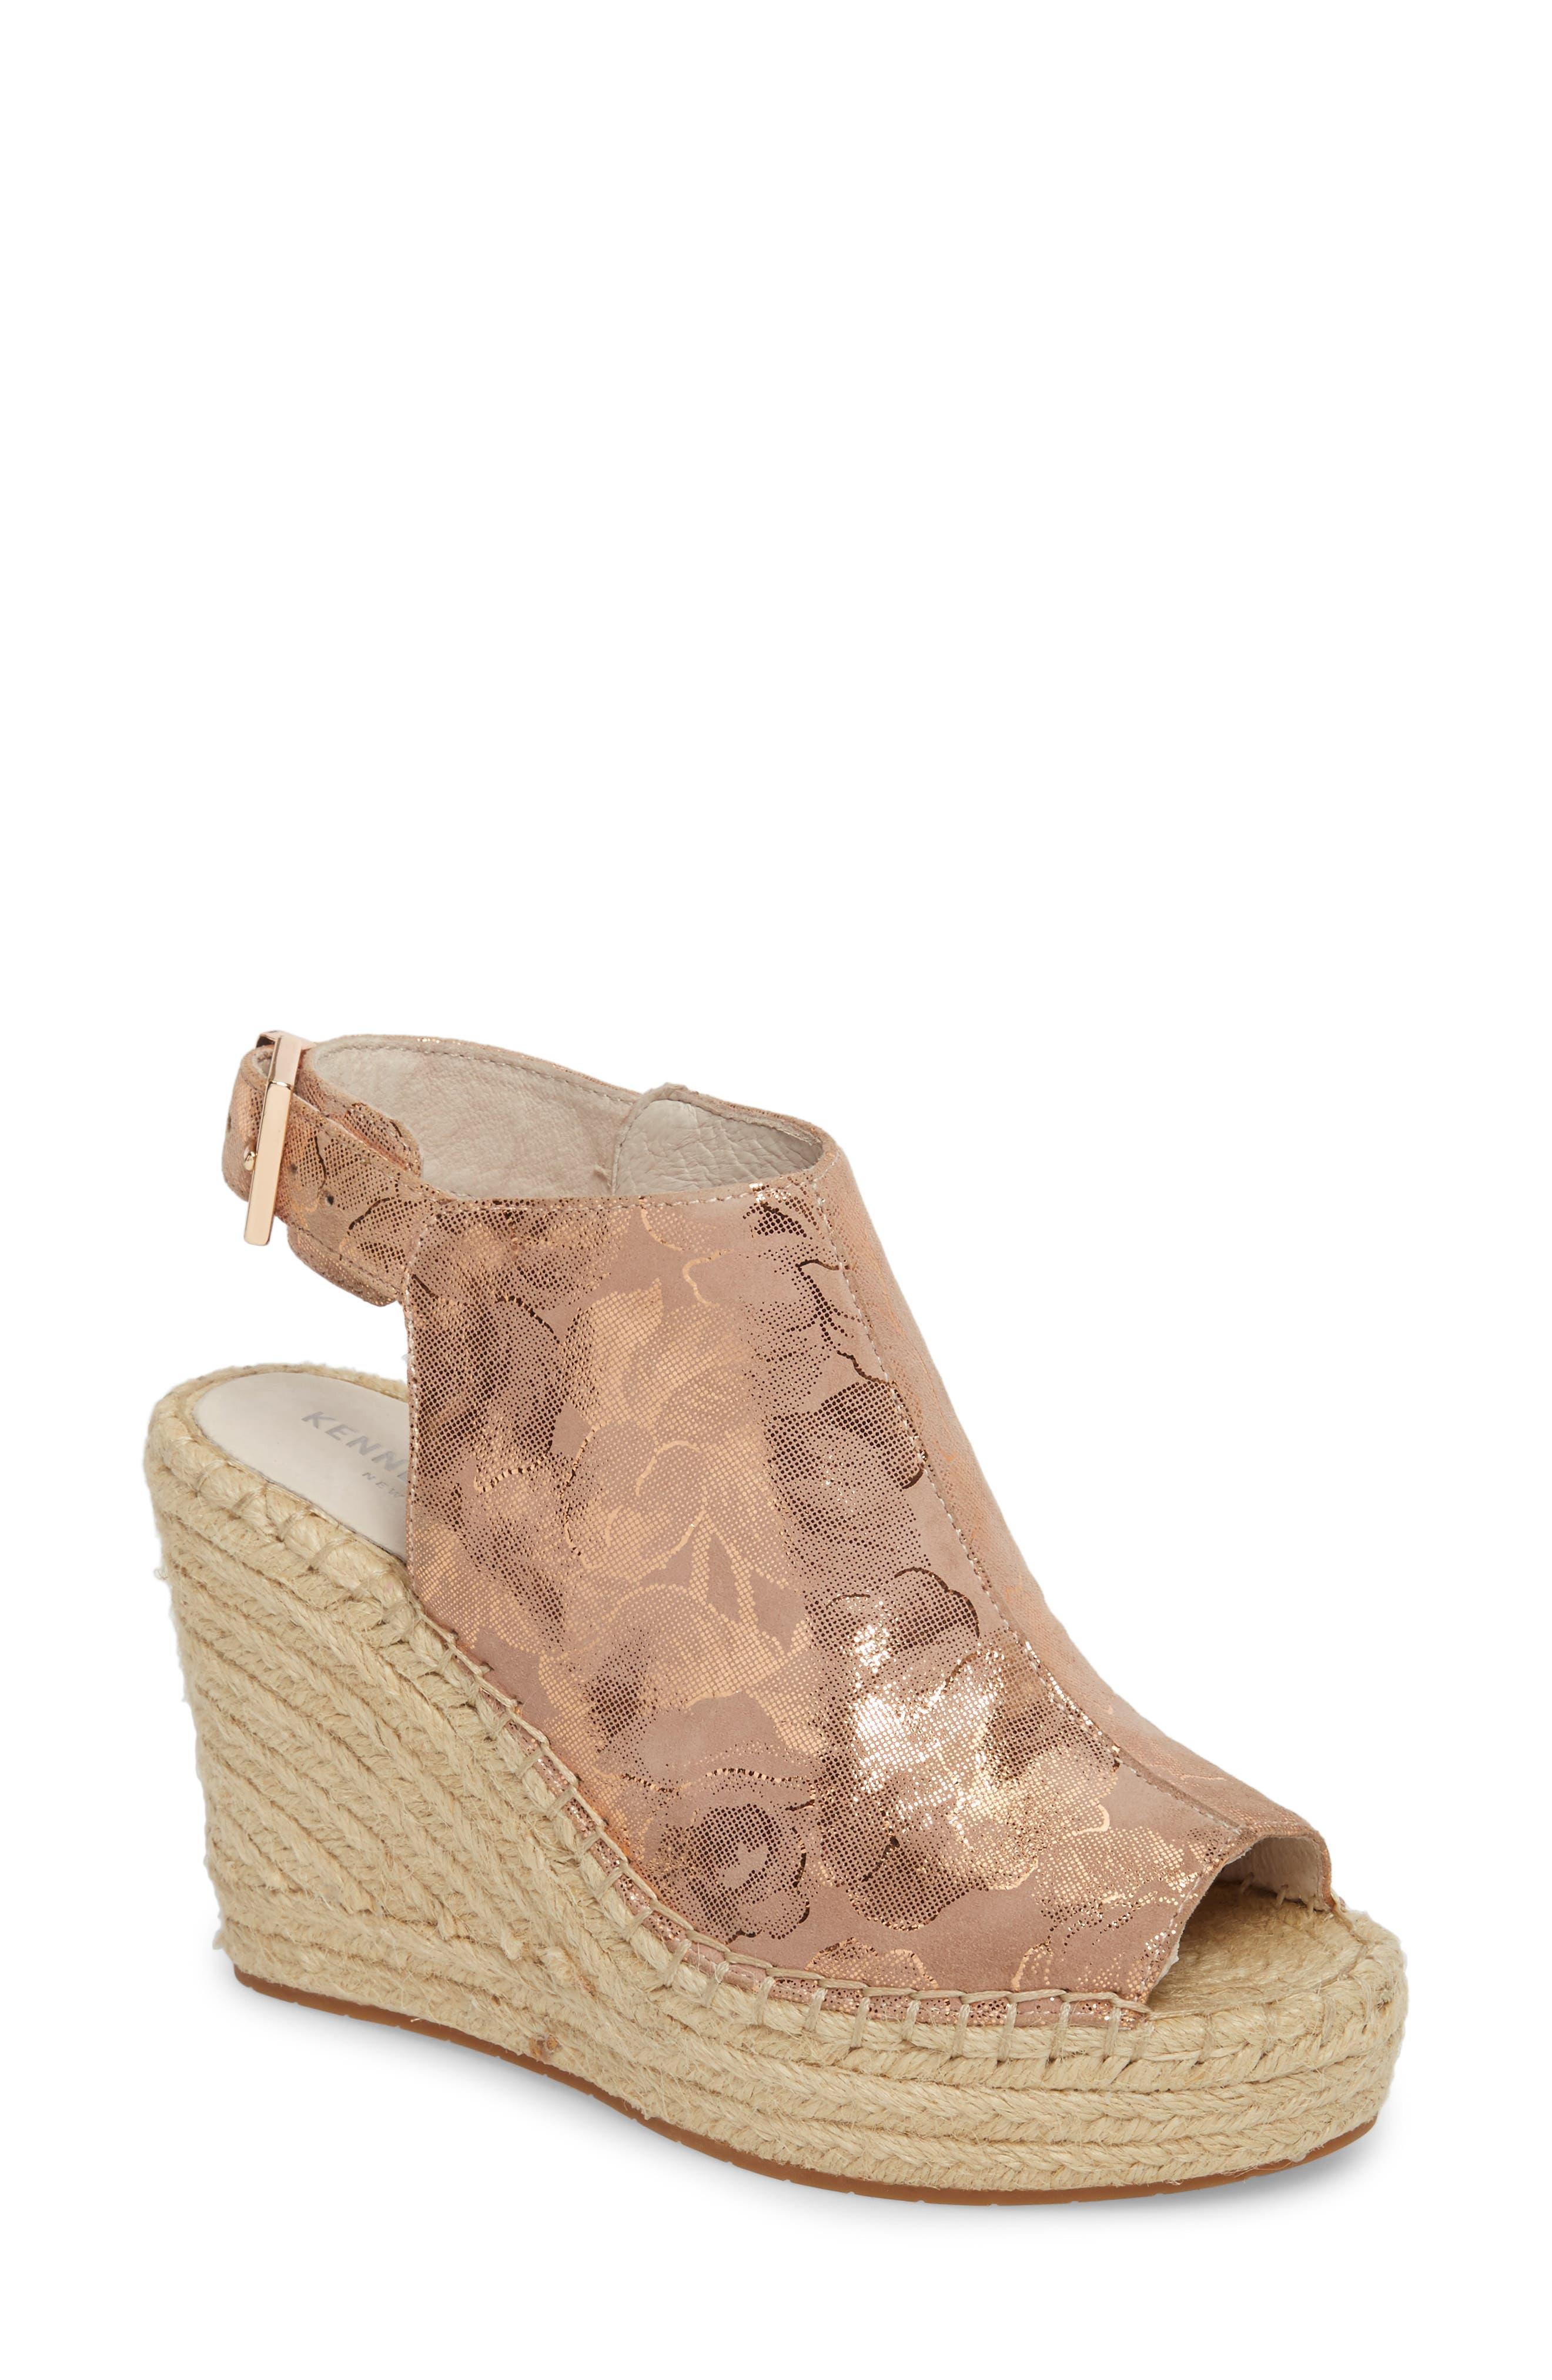 Alternate Image 1 Selected - Kenneth Cole New York 'Olivia' Wedge Sandal (Women)